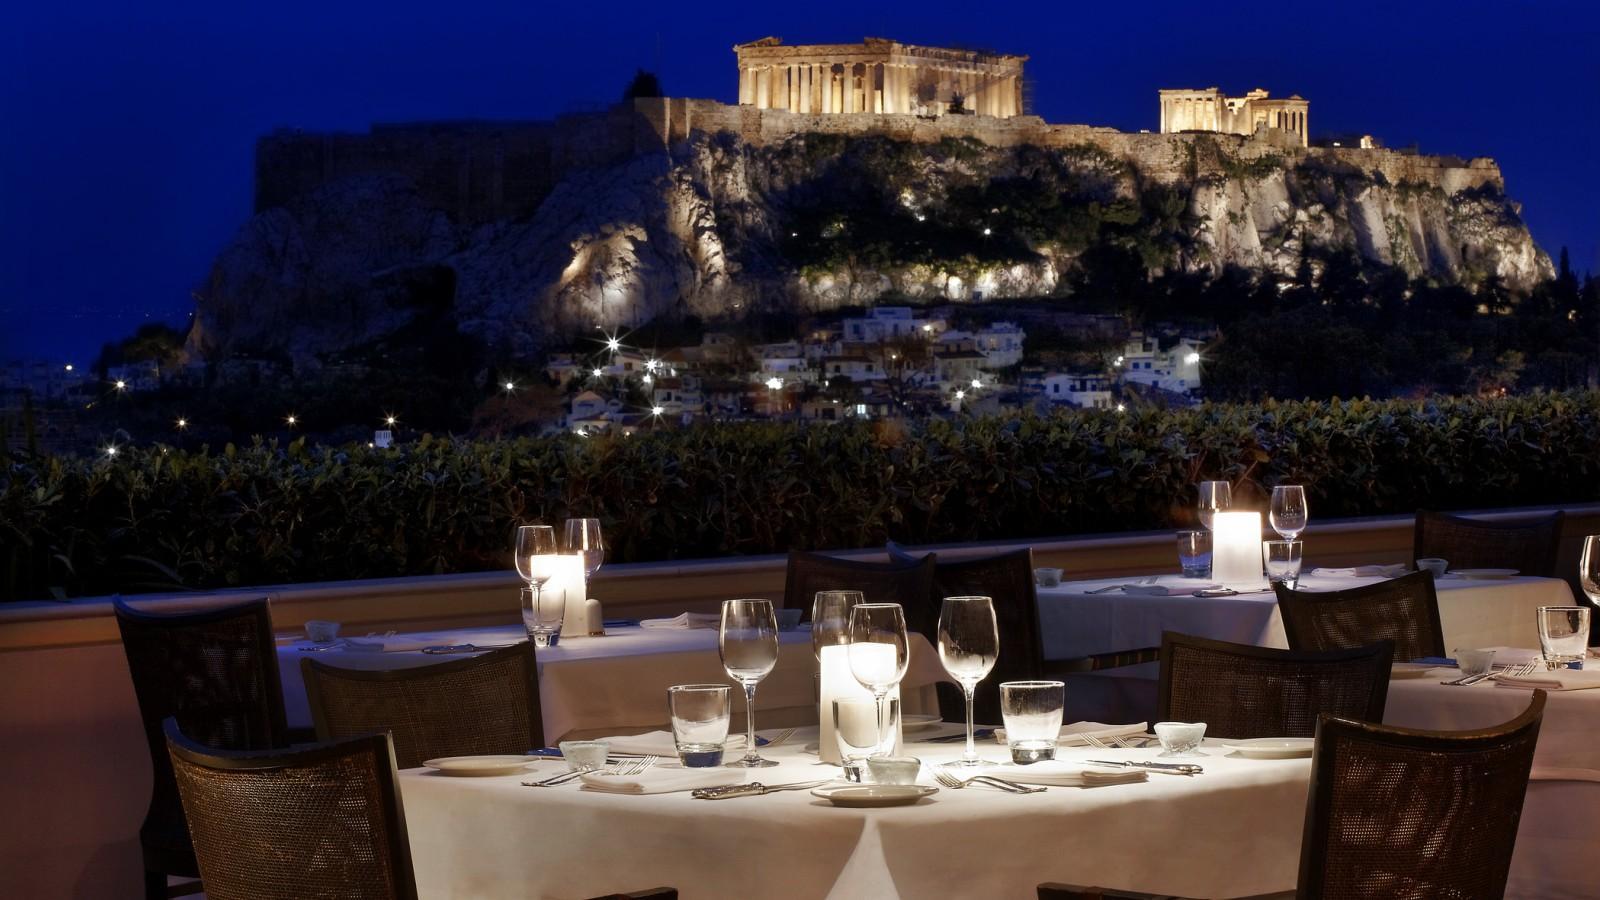 hd-hotel-grande-bretagne-athens-gb-roof-garden-restaurant-and-bar-romantic1